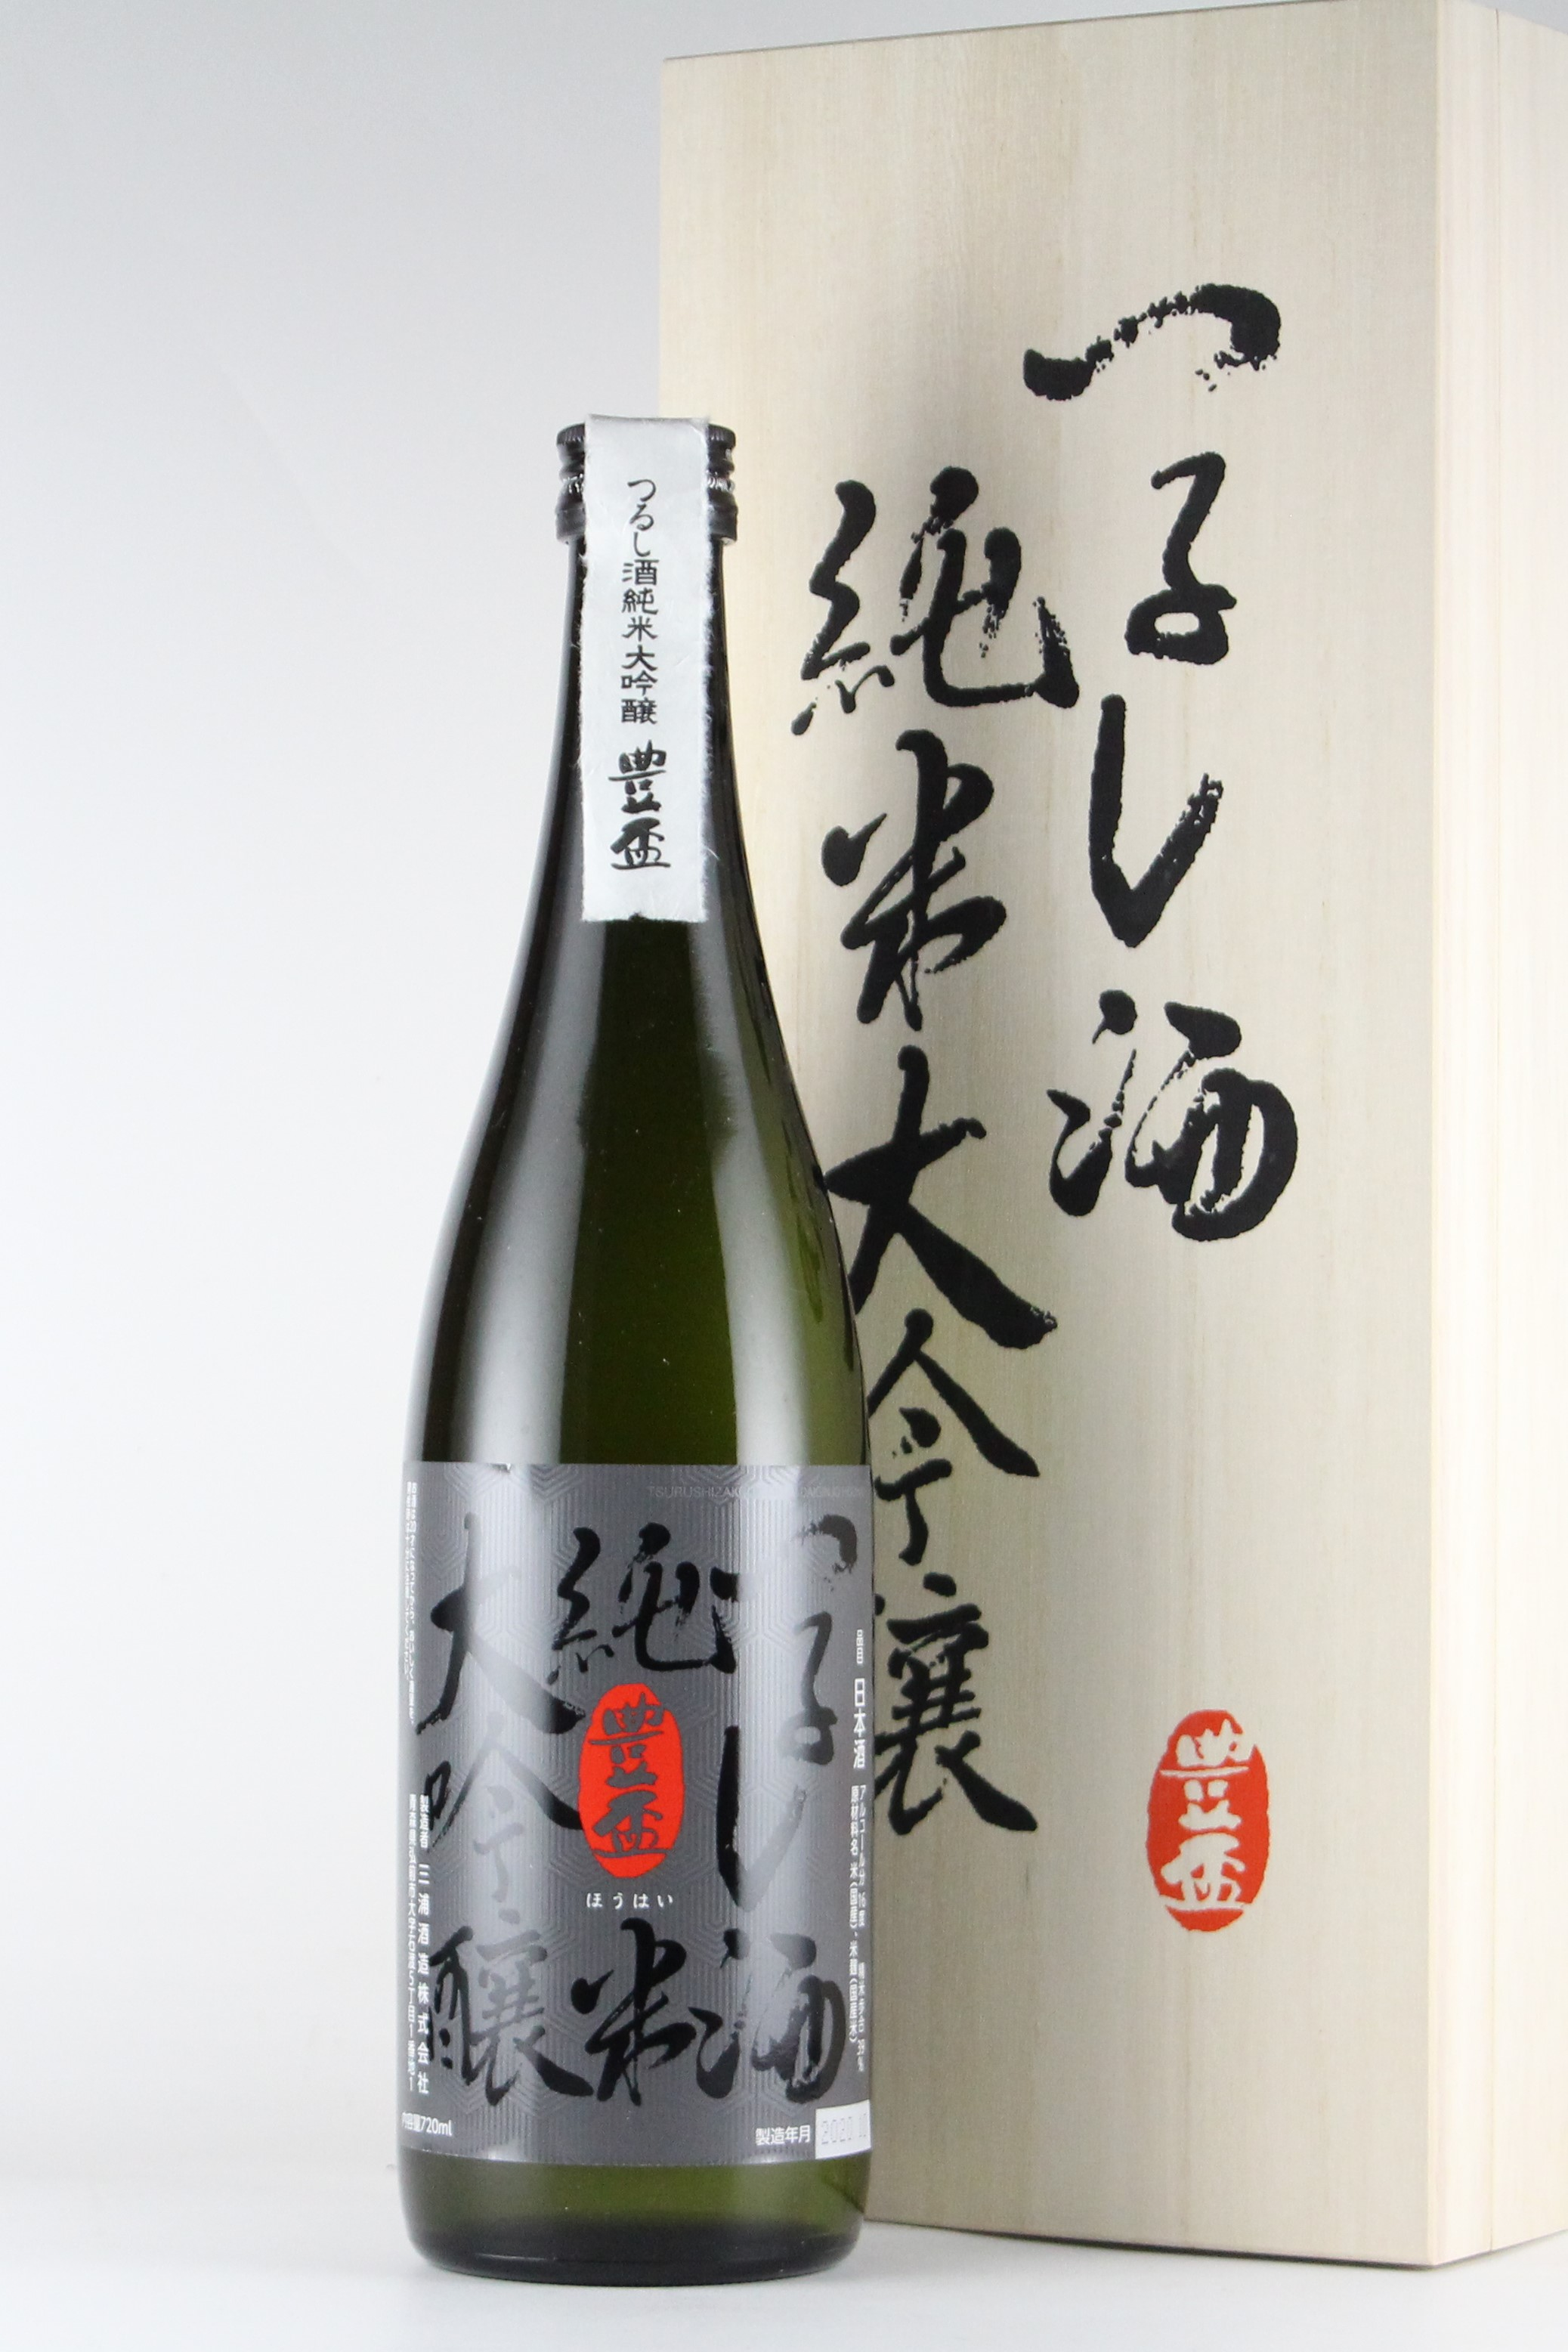 豊盃 つるし酒 純米大吟醸無濾過原酒 720ml 【青森/三浦酒造】